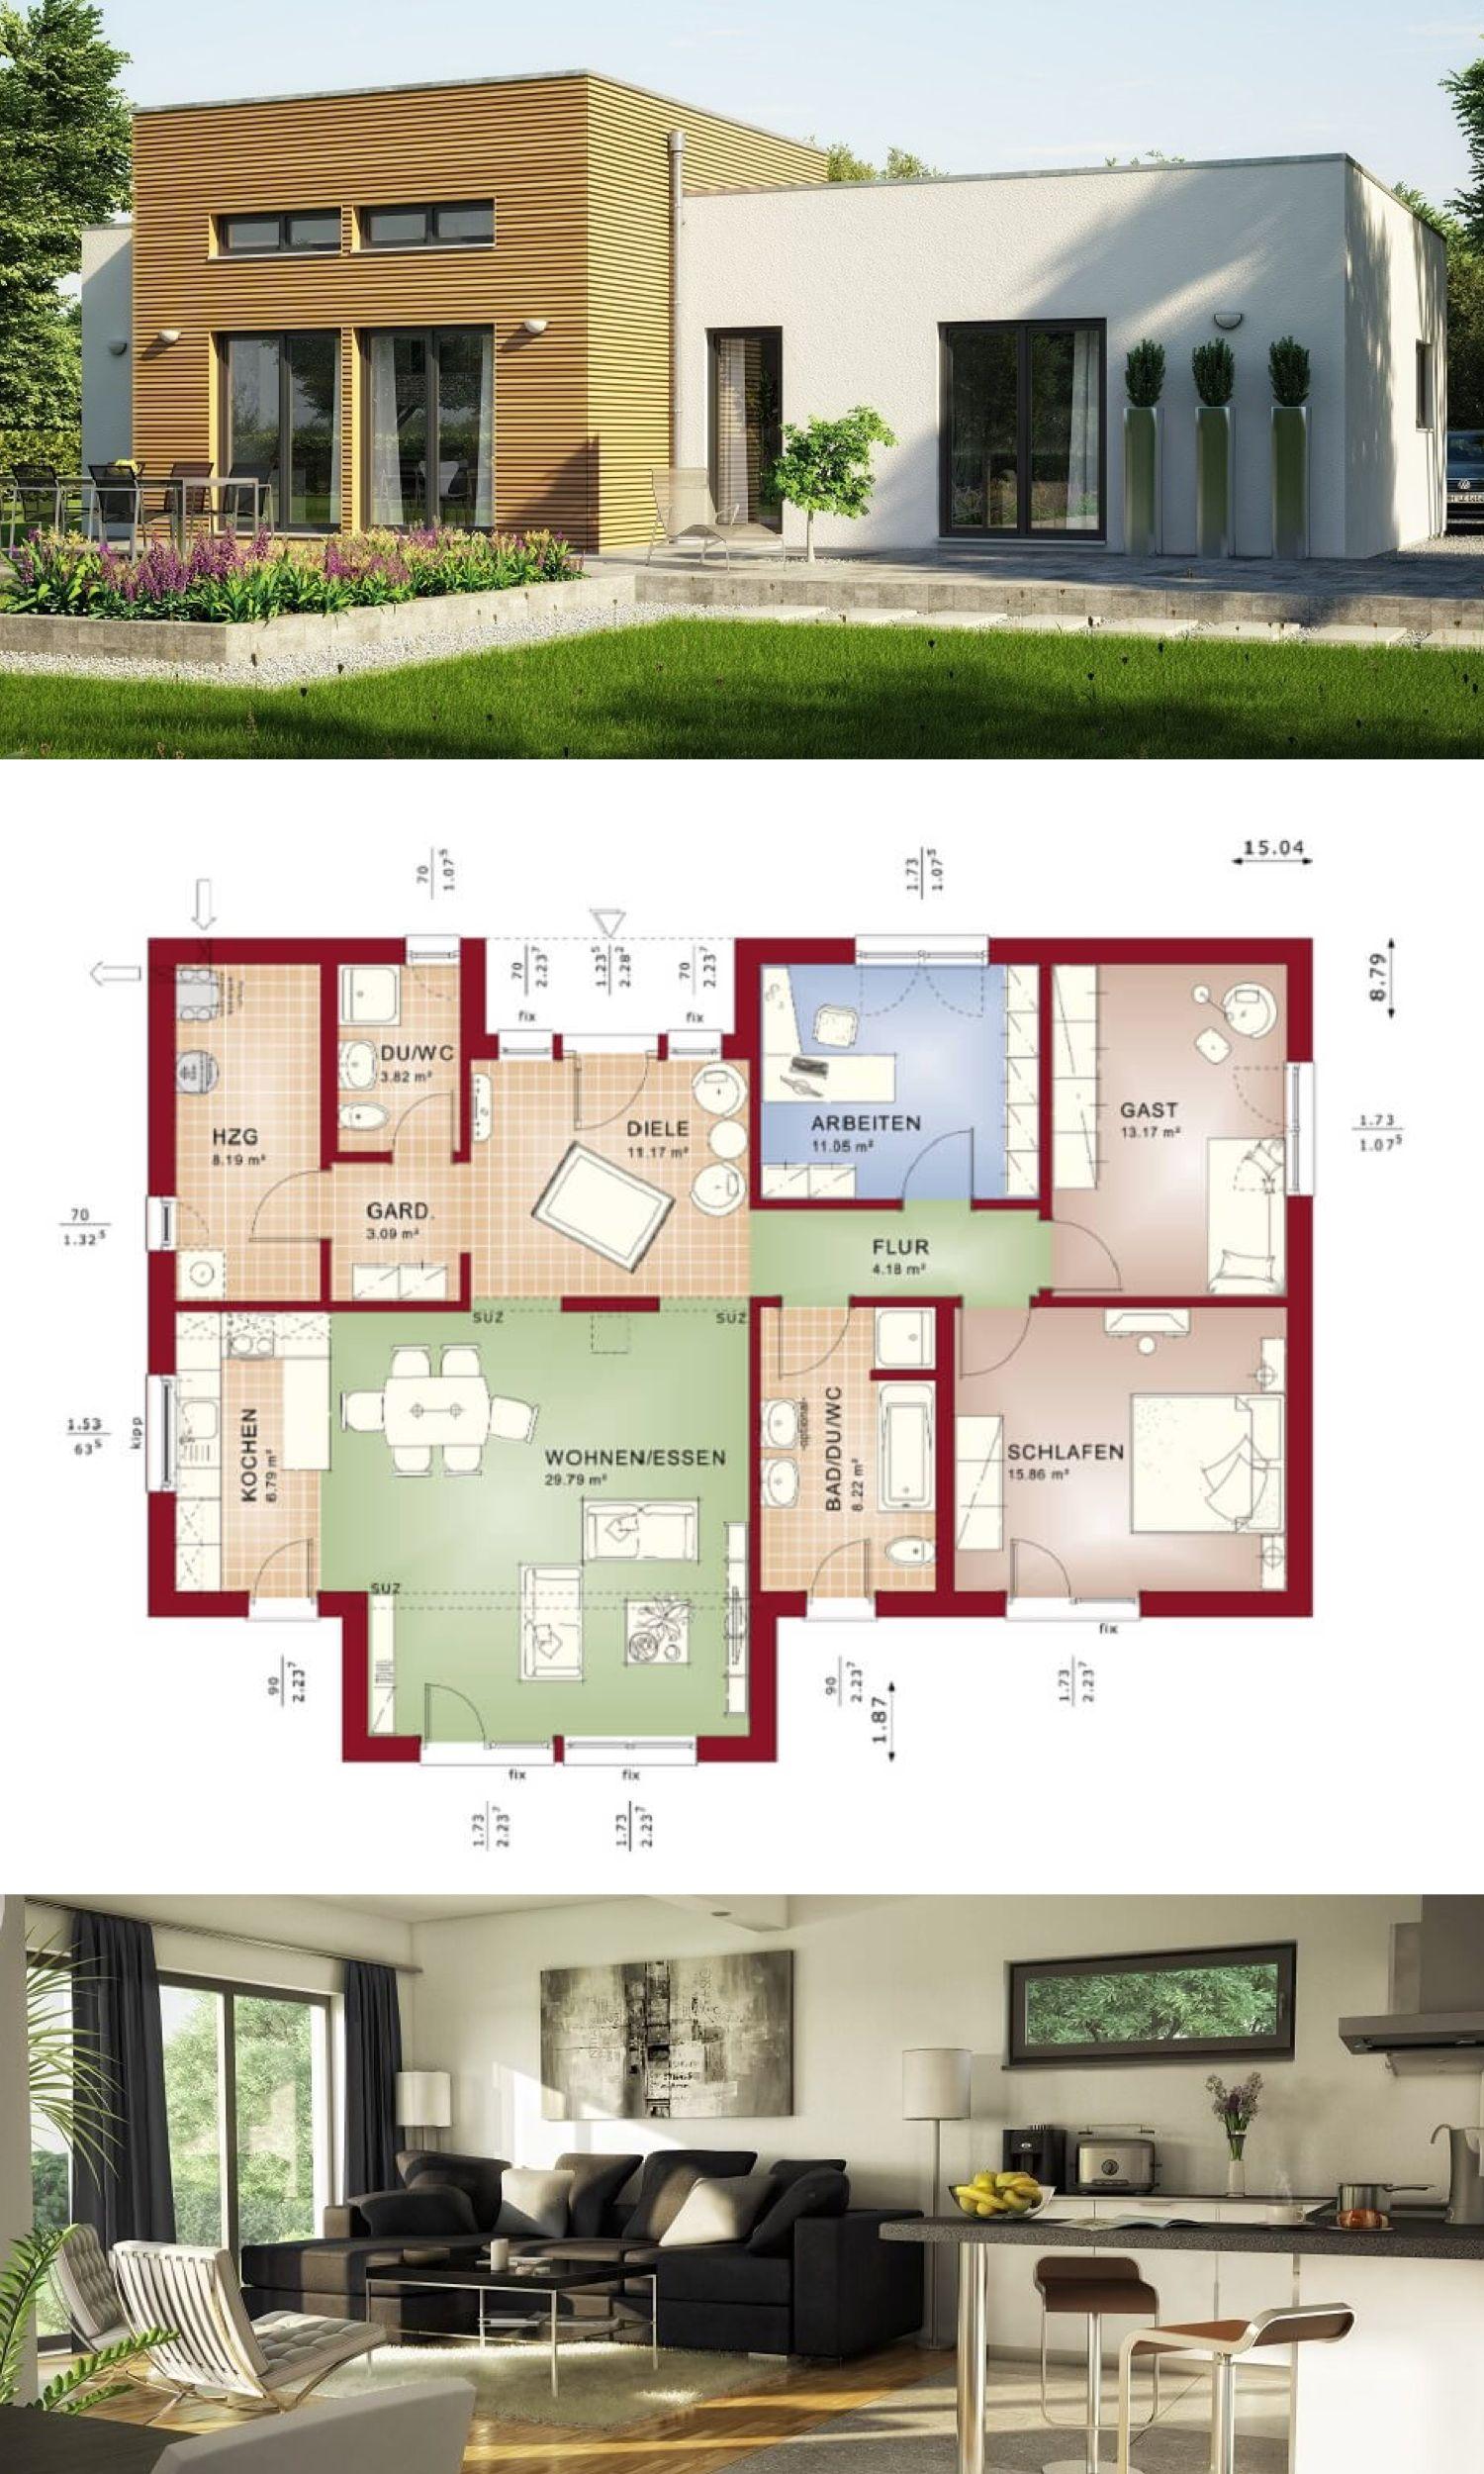 Bungalow Haus Evolution 111 V4 Bien Zenker - Moderner Bungalow mit ...